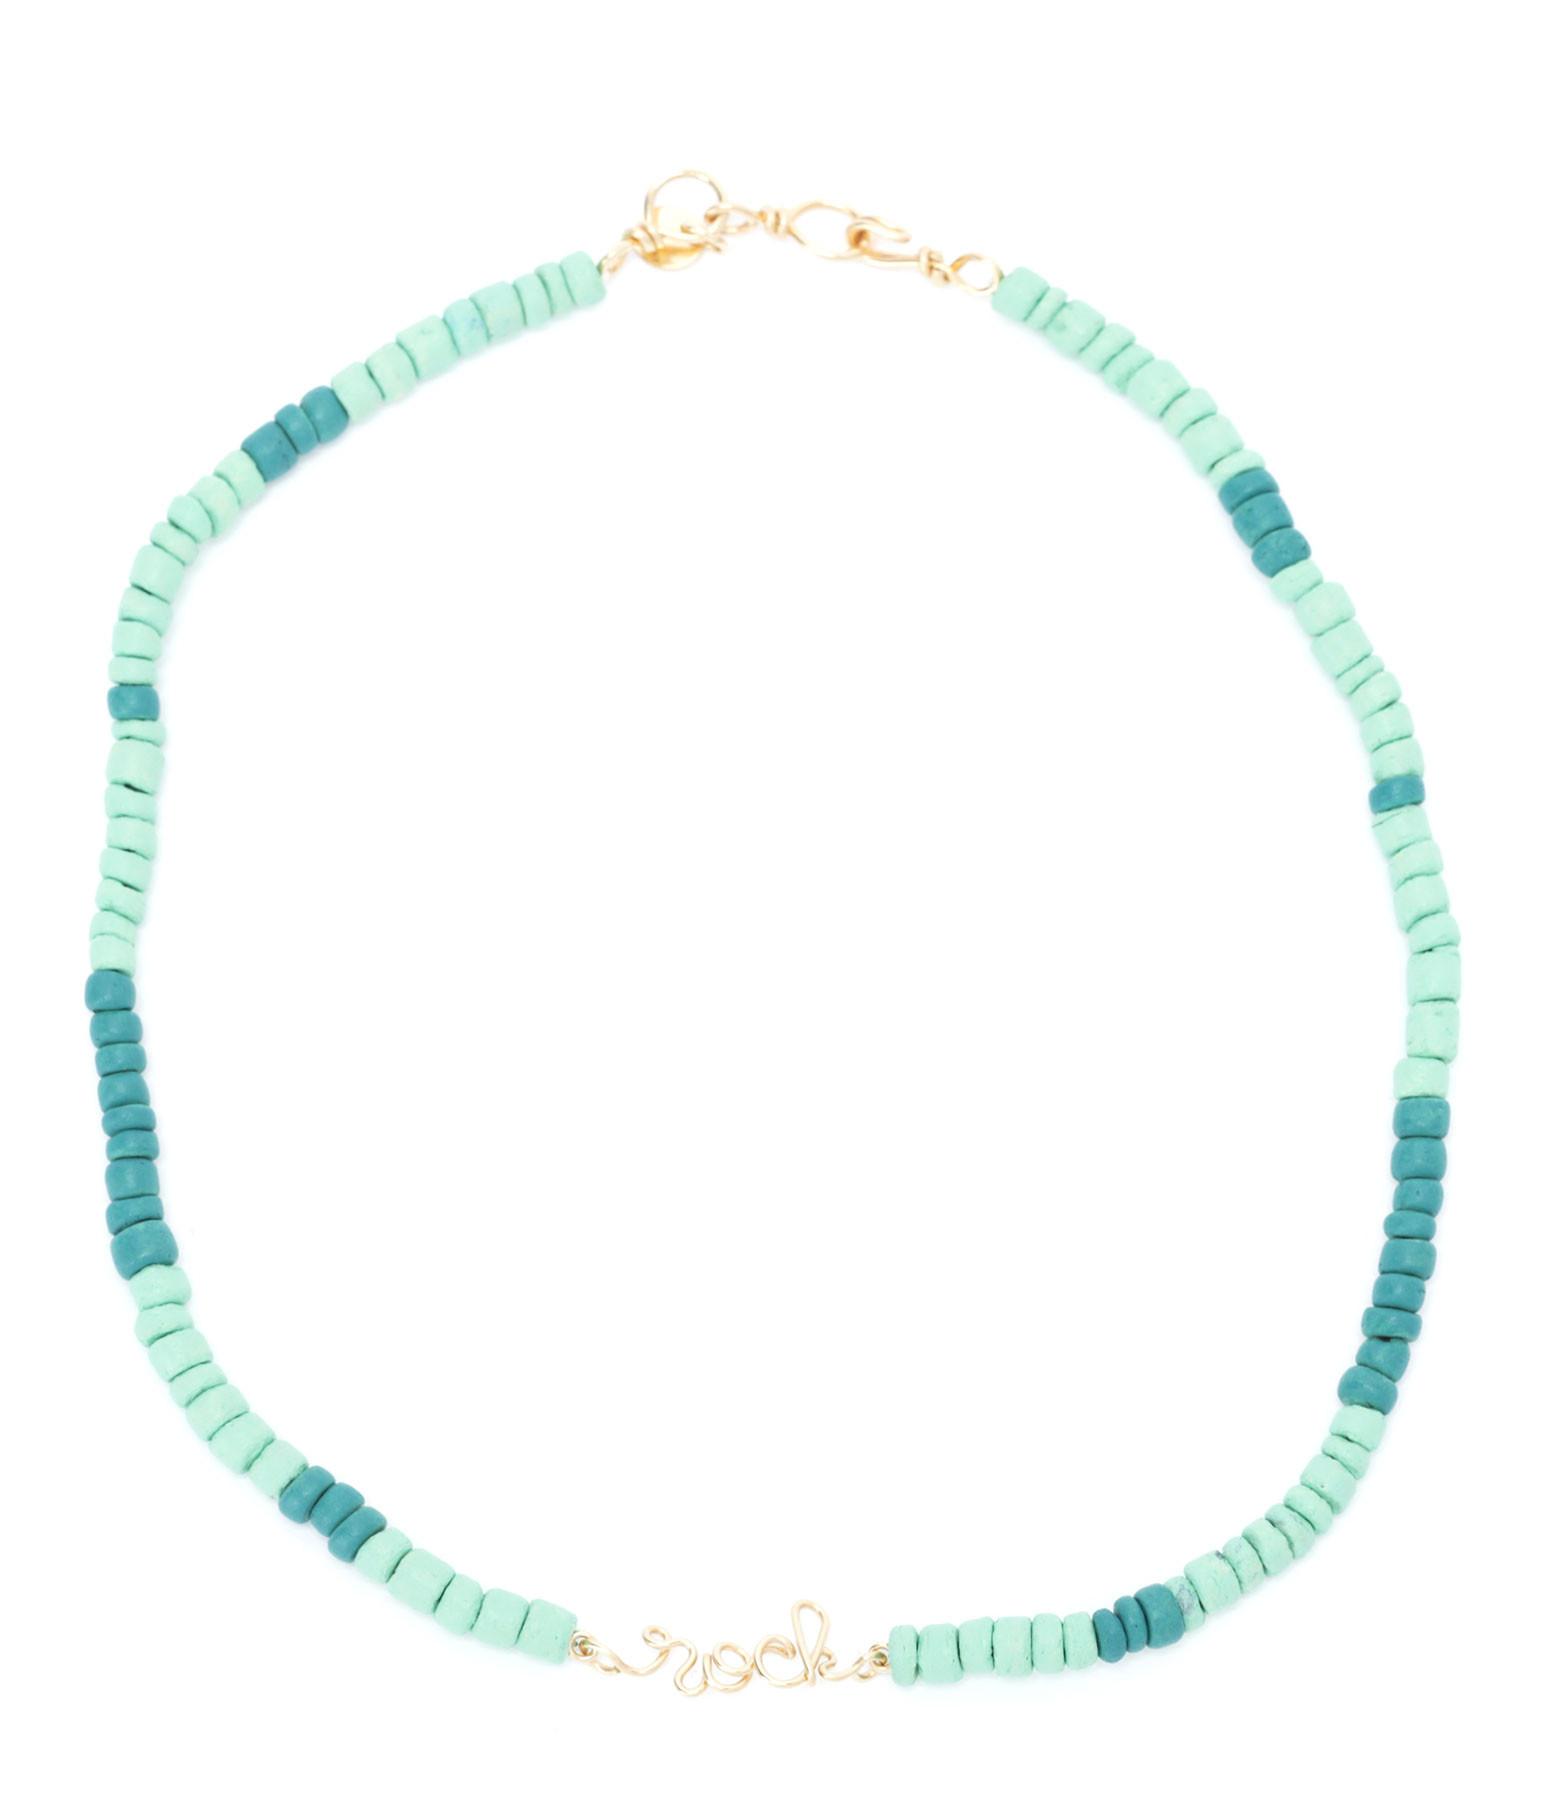 ATELIER PAULIN - Collier Medina Rock Viridien Turquoise Gold Filled, Collection Marrakech